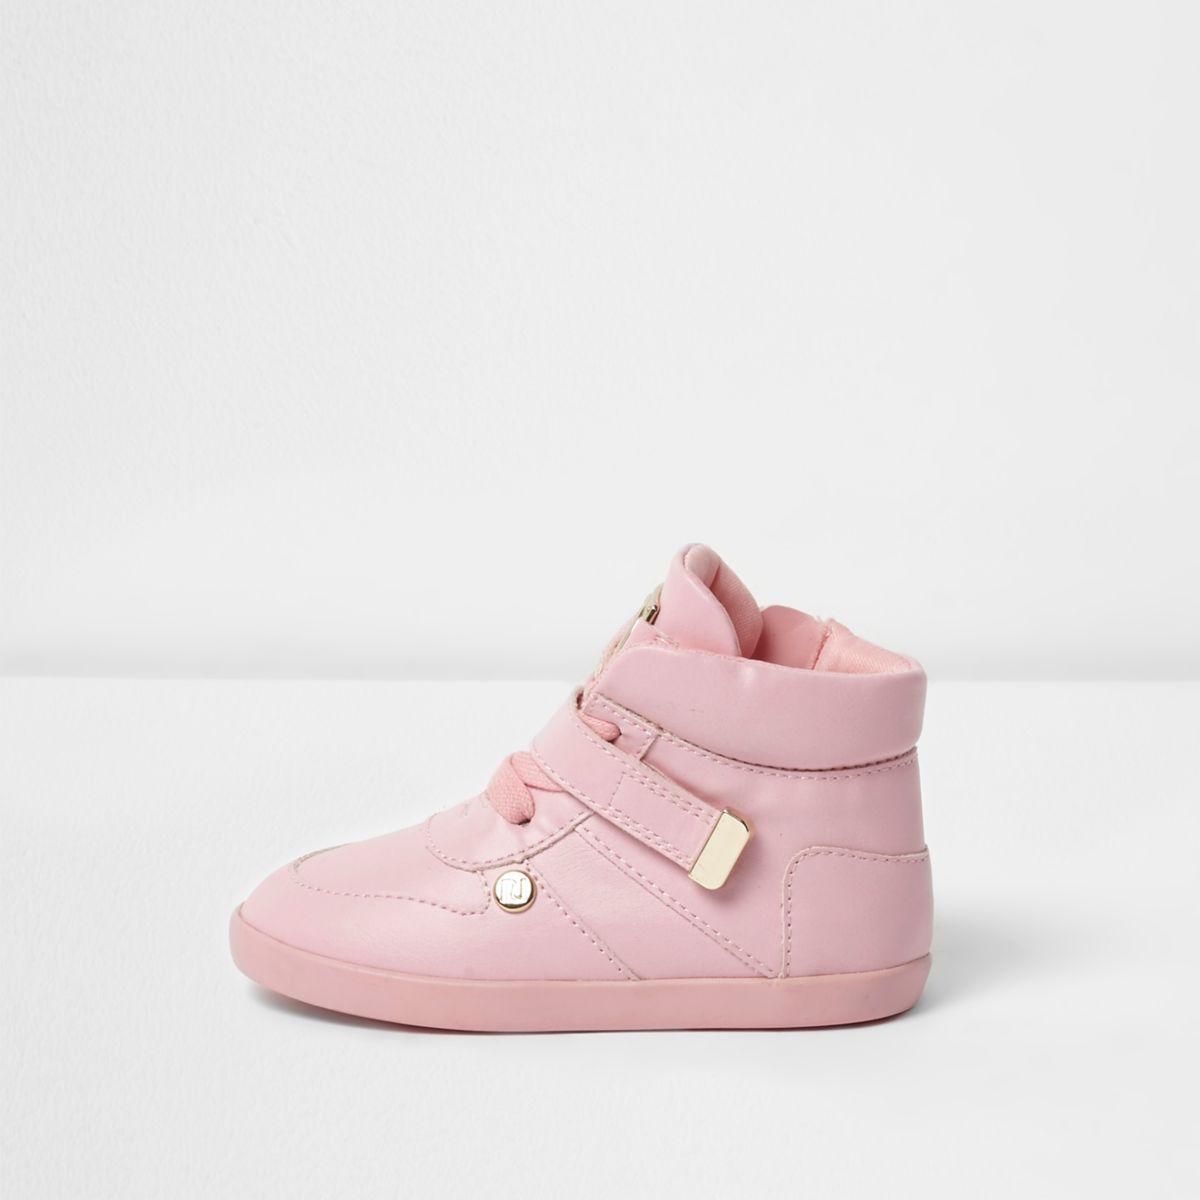 Mini girls pink velcro high top sneakers